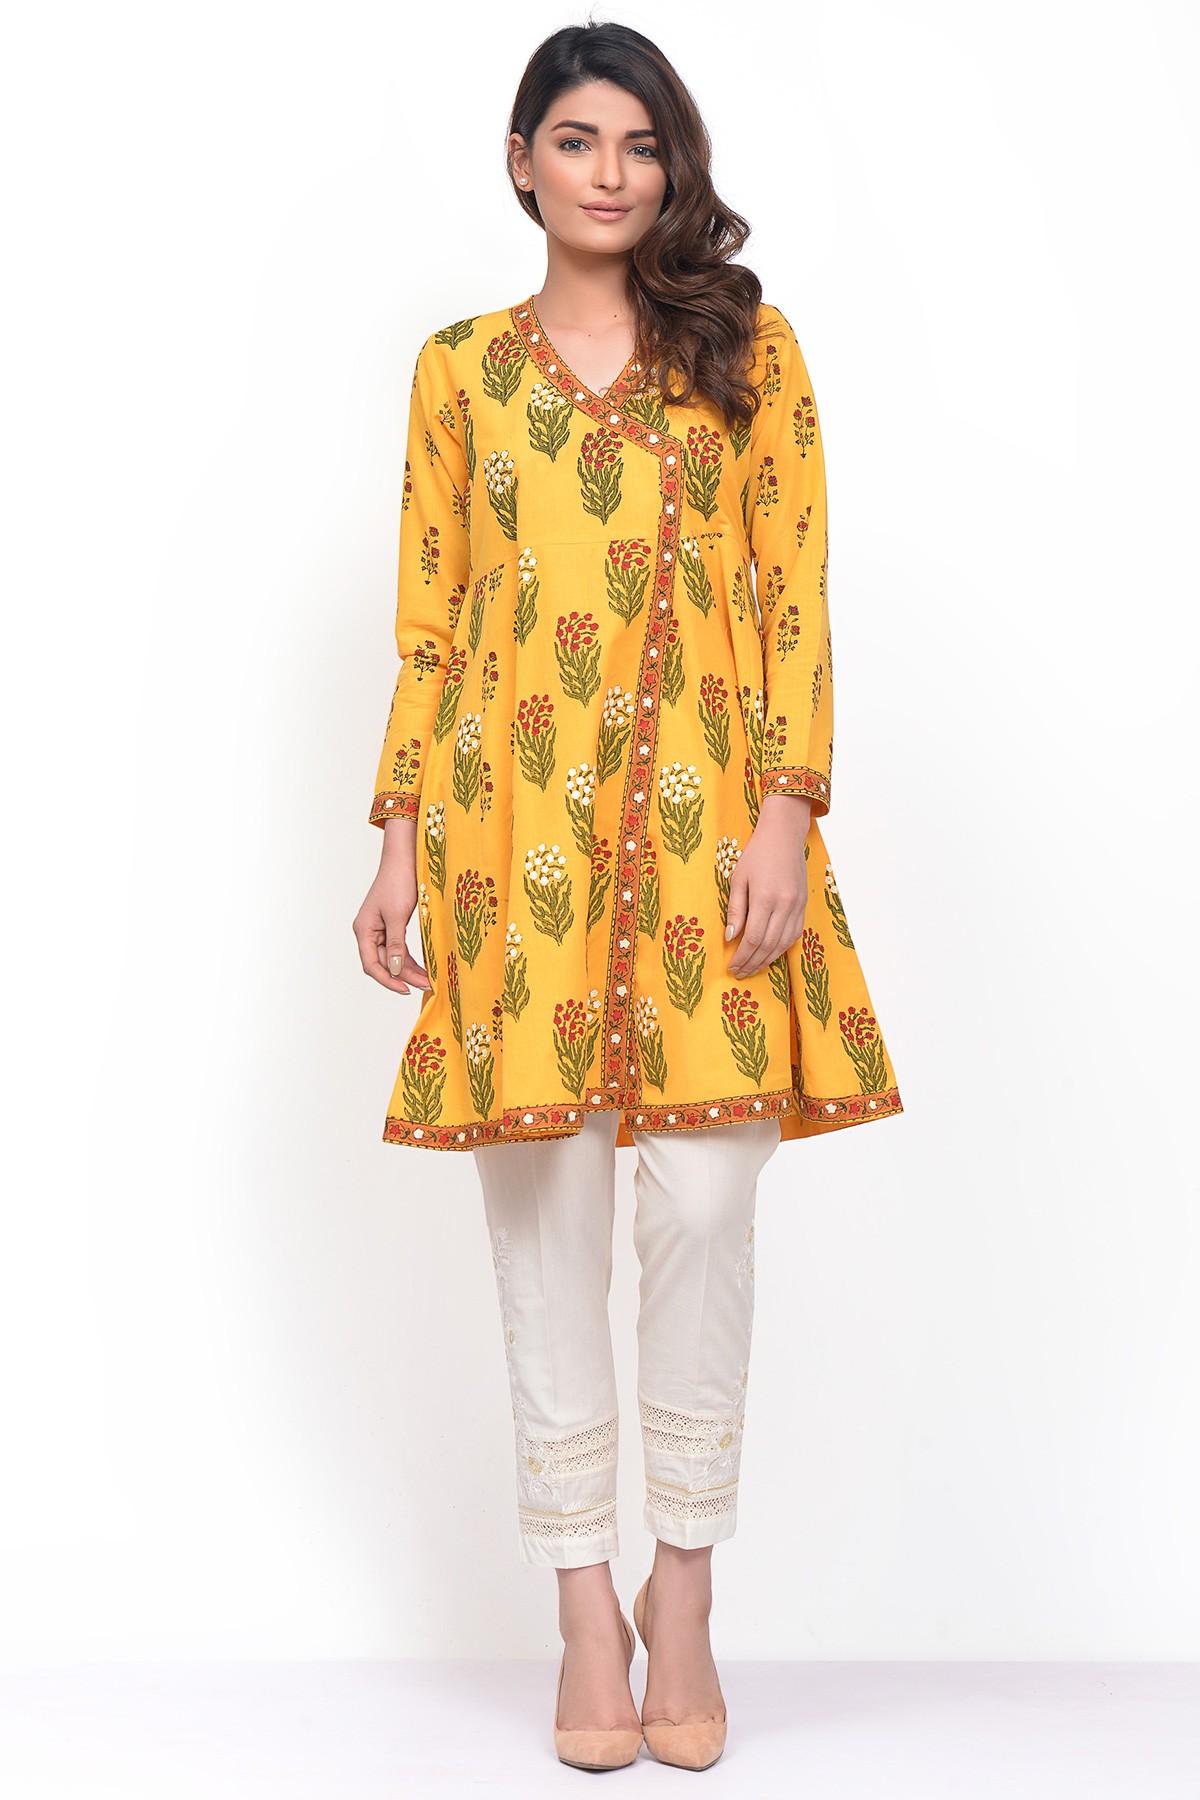 Khaadi Stylish Summer Kurtas Dresses Ready to Wear Pret Spring Collection 2017-18 (4)